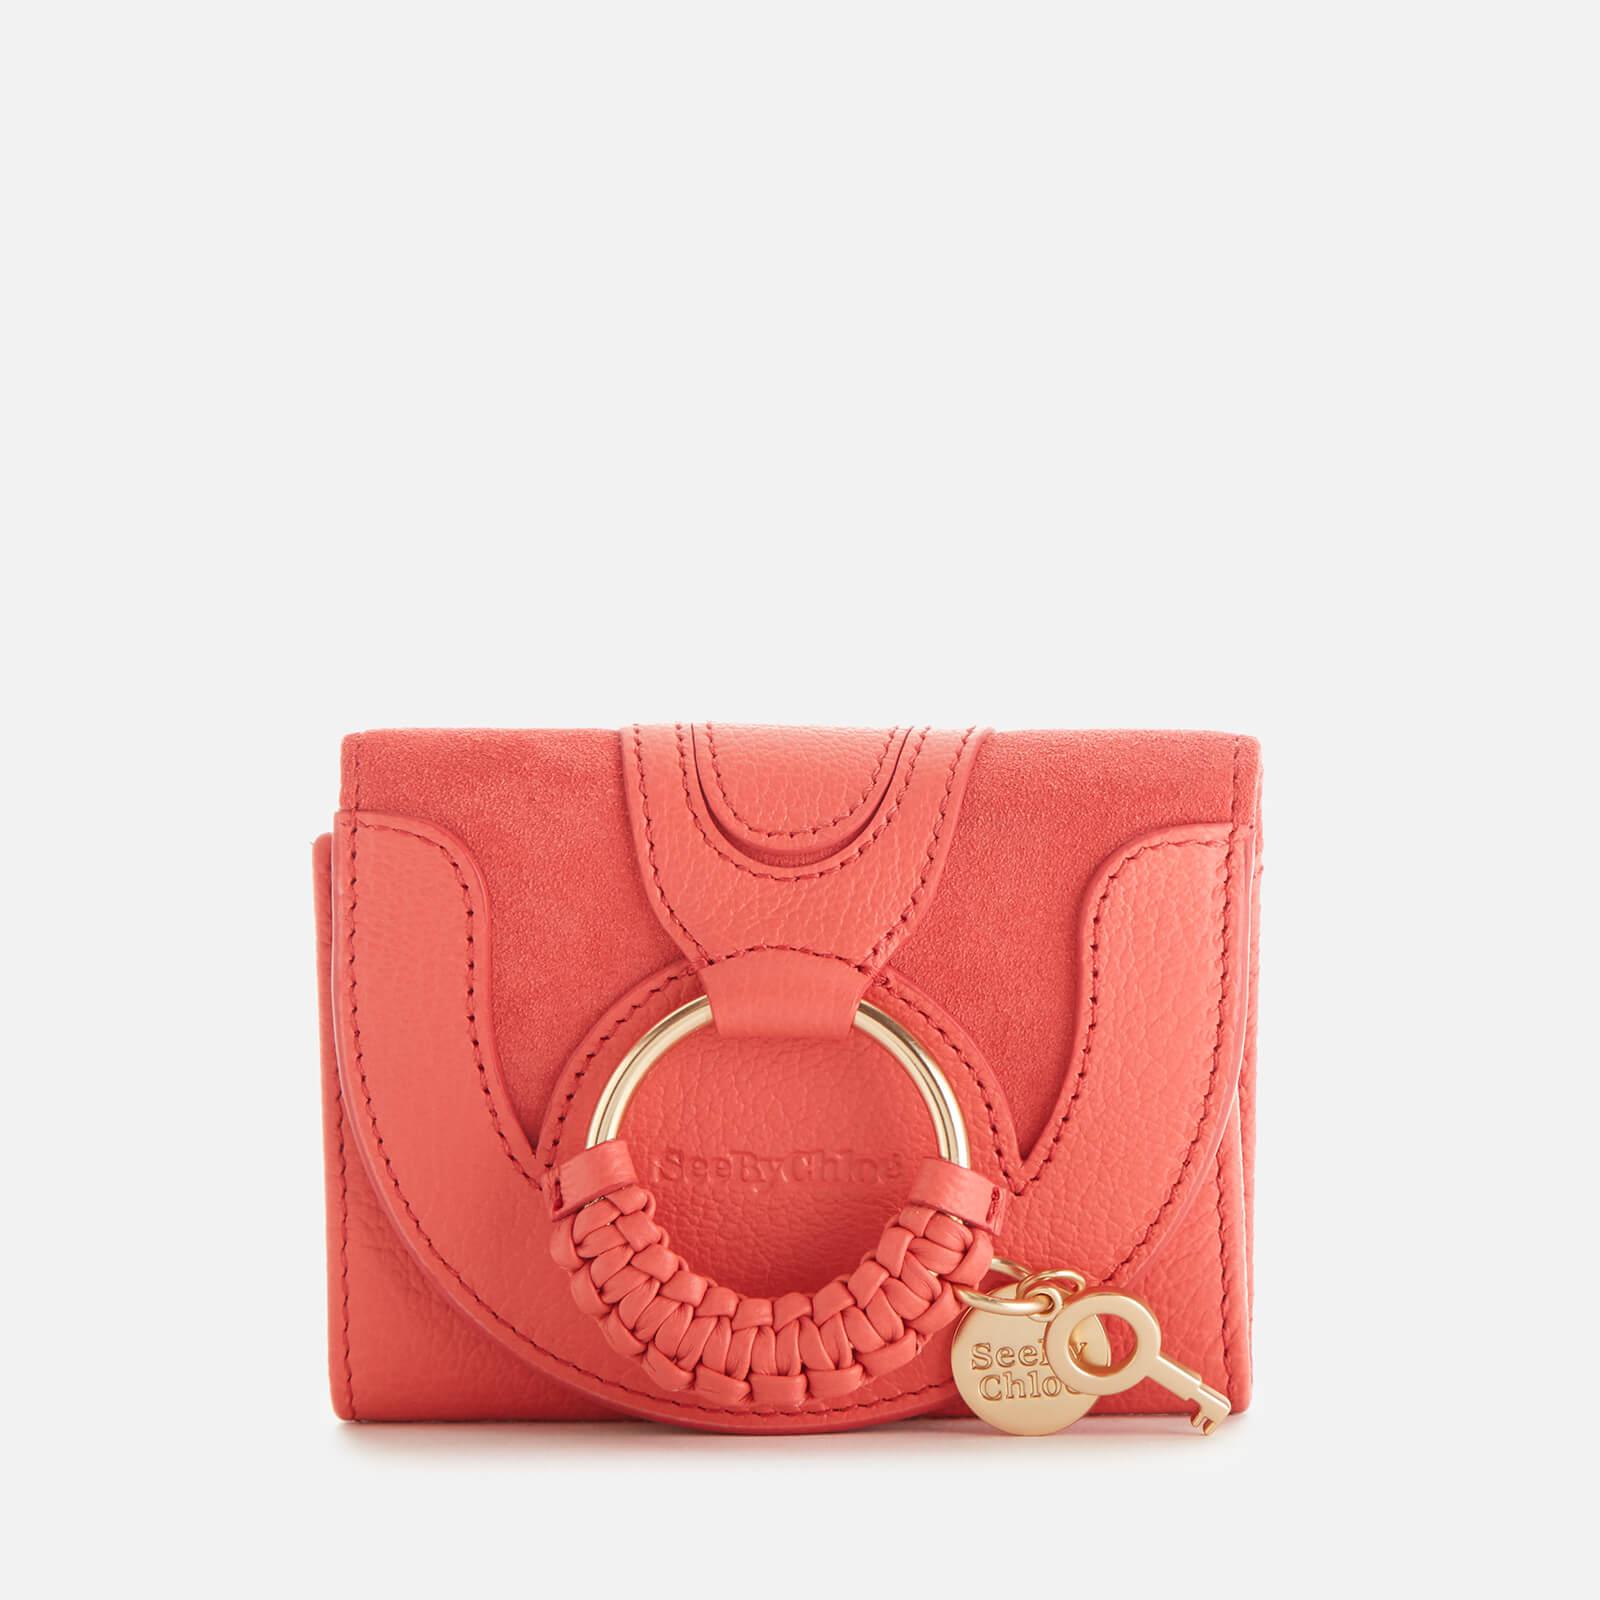 b1586a90ac See By Chloé Women's Hana Purse - Wooden Pink